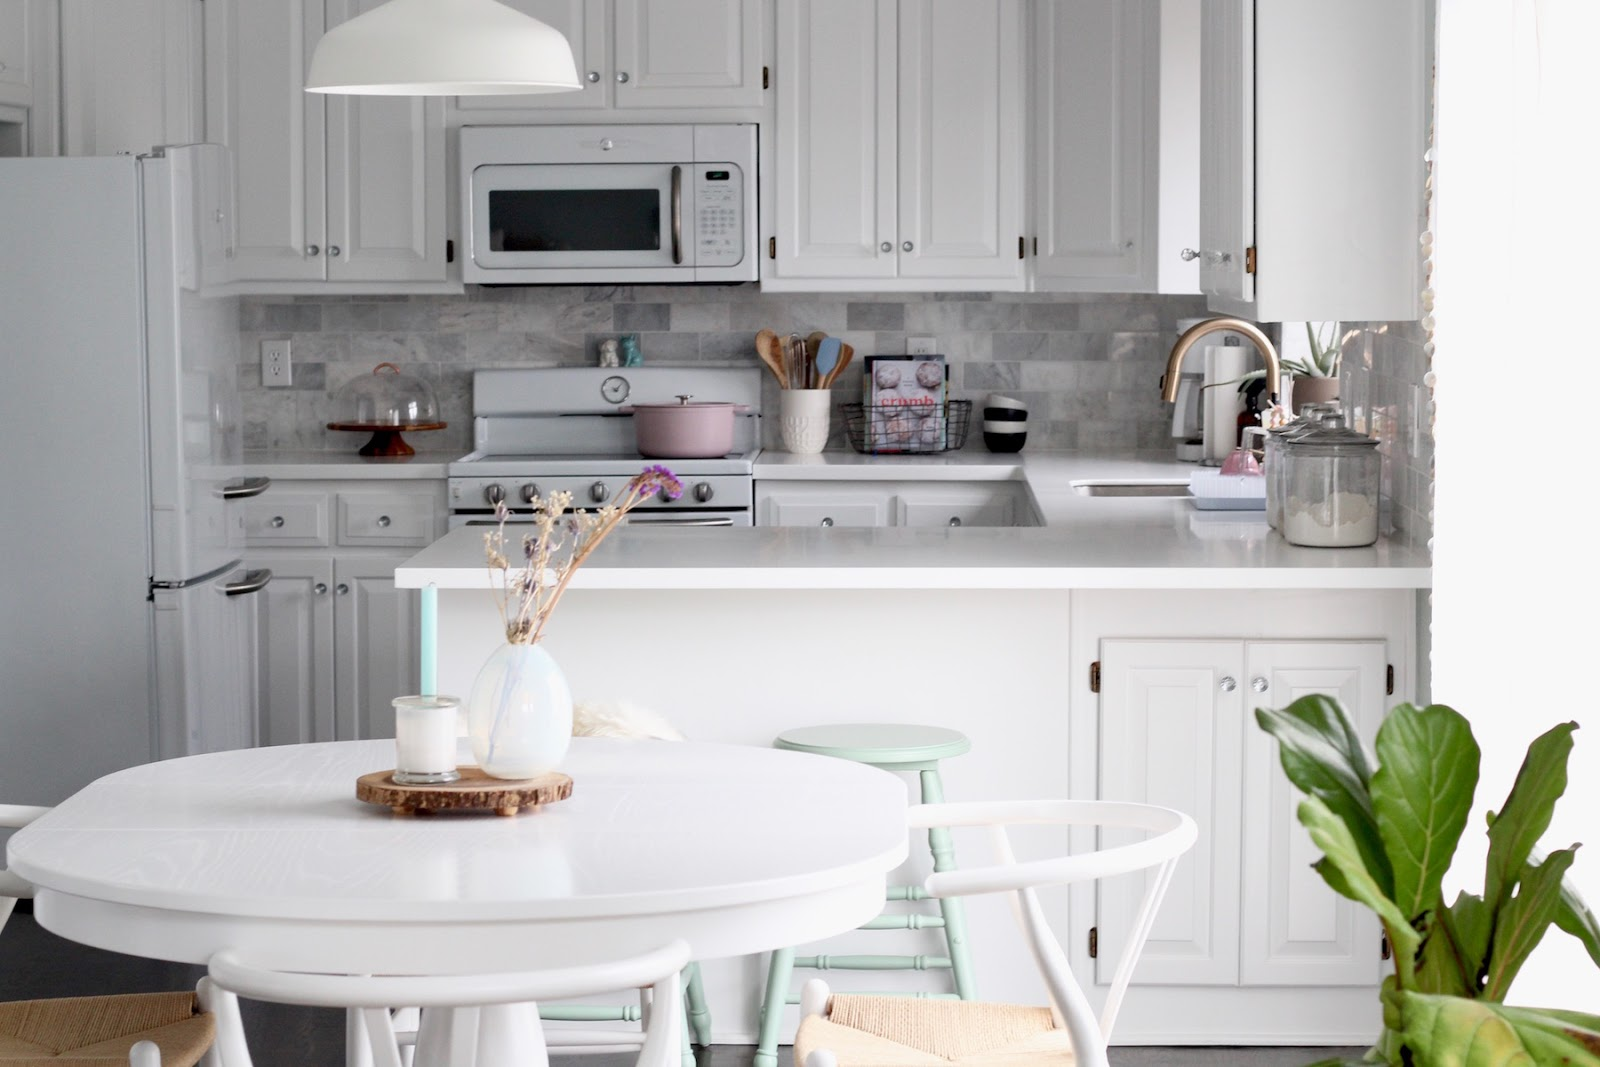 Our Kitchen Renovation & Project Details